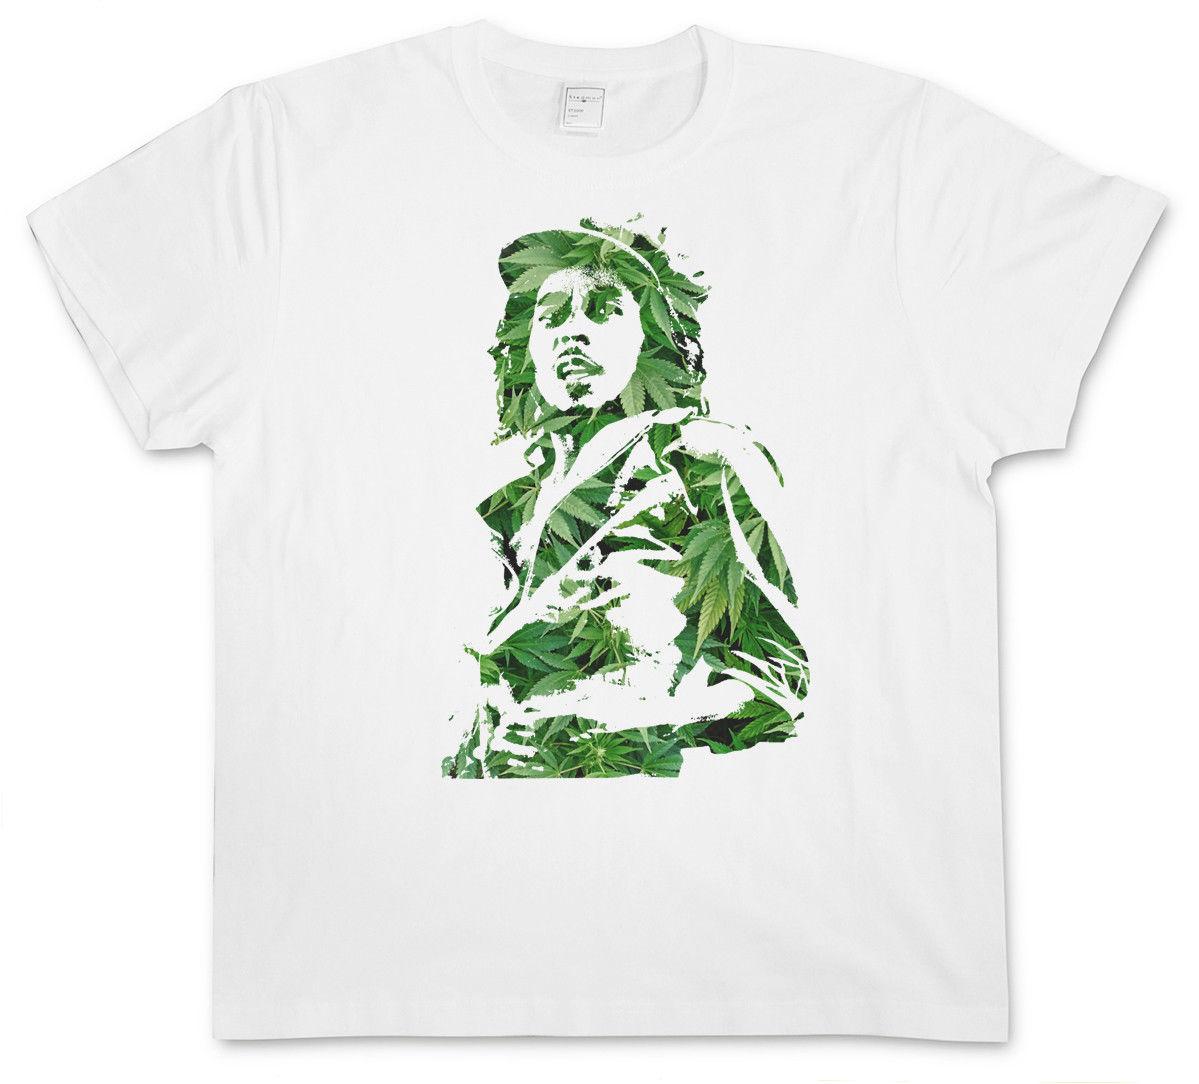 GANJA BOB I T-SHIRT - Jamaica Marley Cannabis Weed Hemp Reggae Wailers Marijuana 1